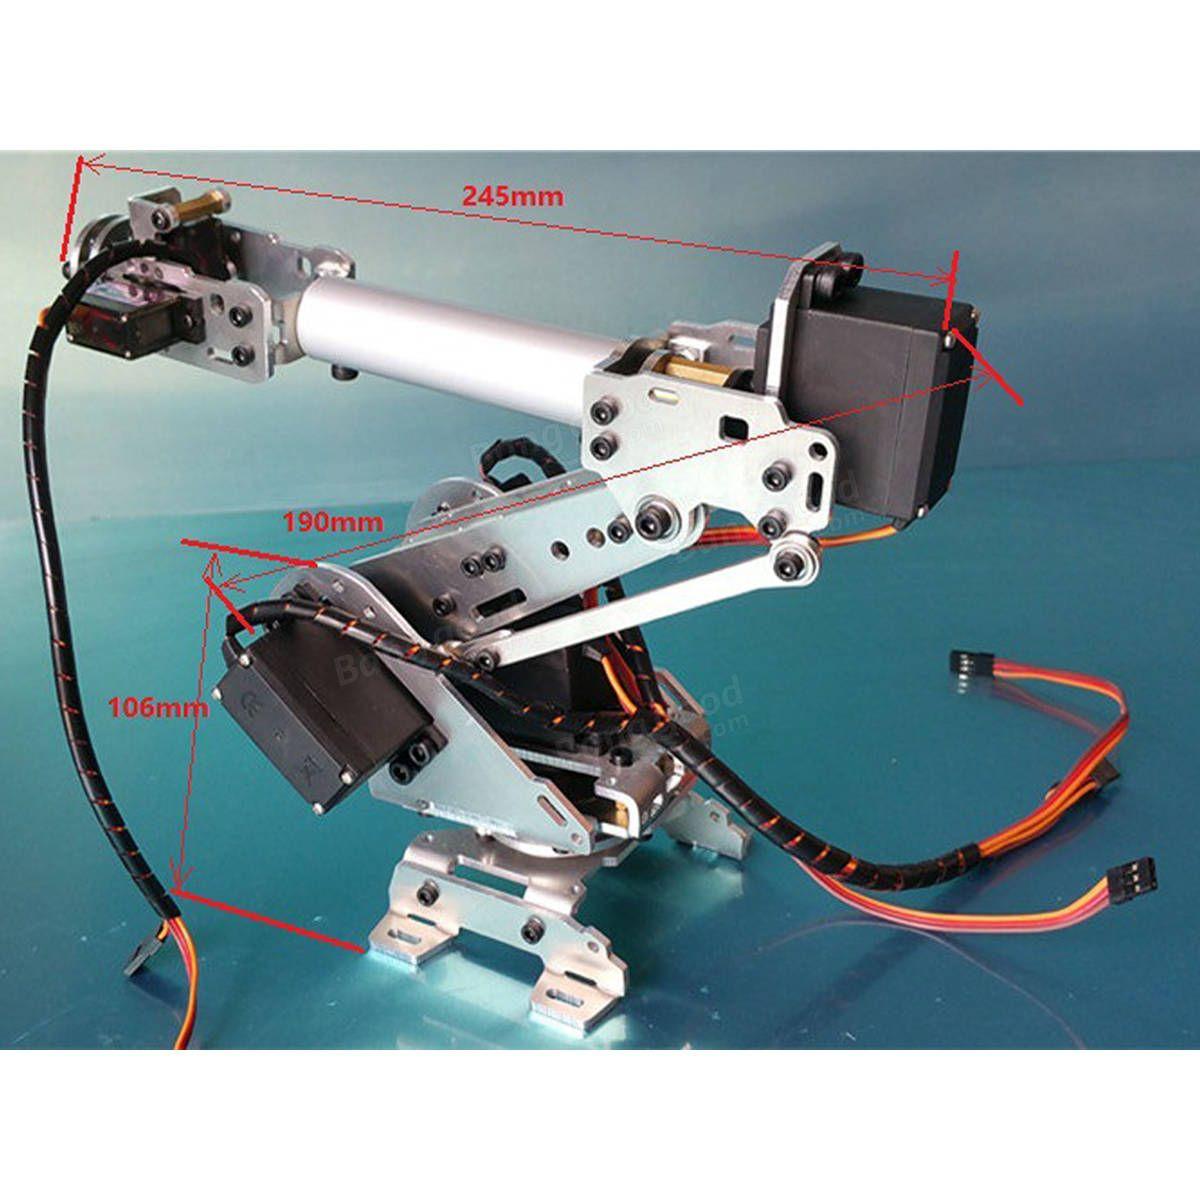 6DOF Mechanical Robot Arm Claw With Servos For Robotics